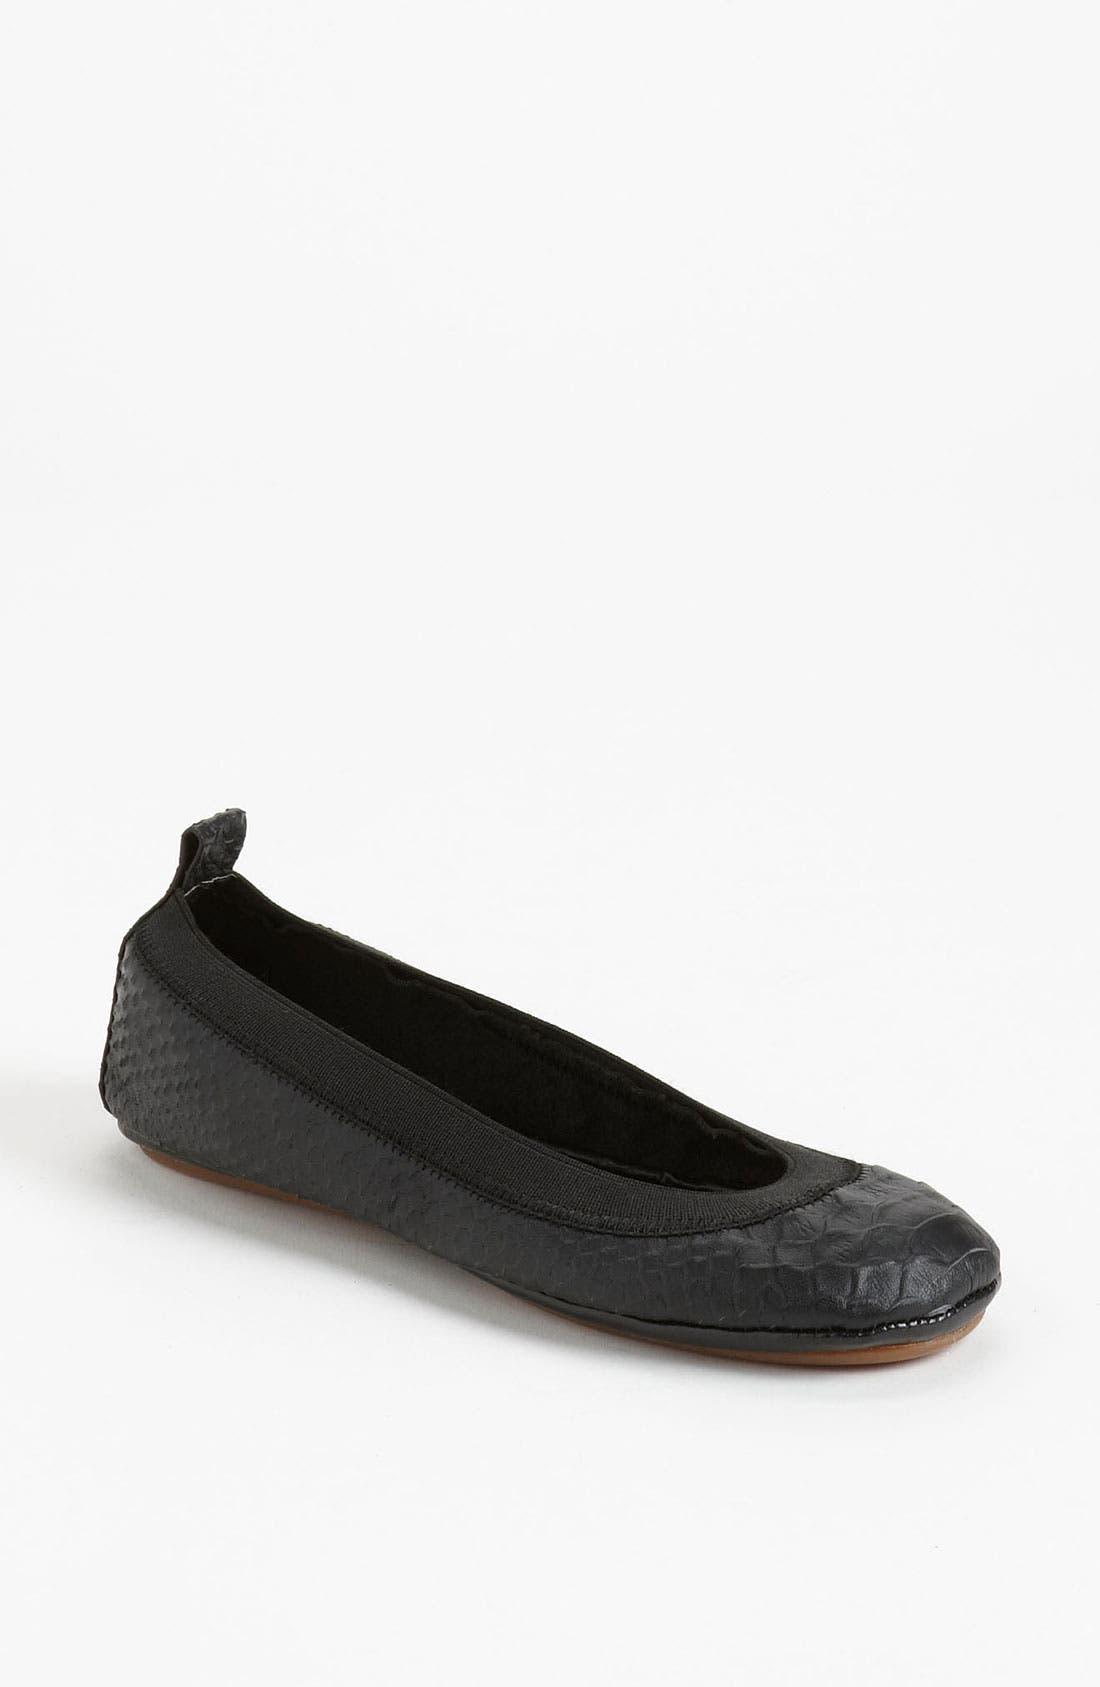 YOSI SAMRA Foldable Ballet Flat, Main, color, 001